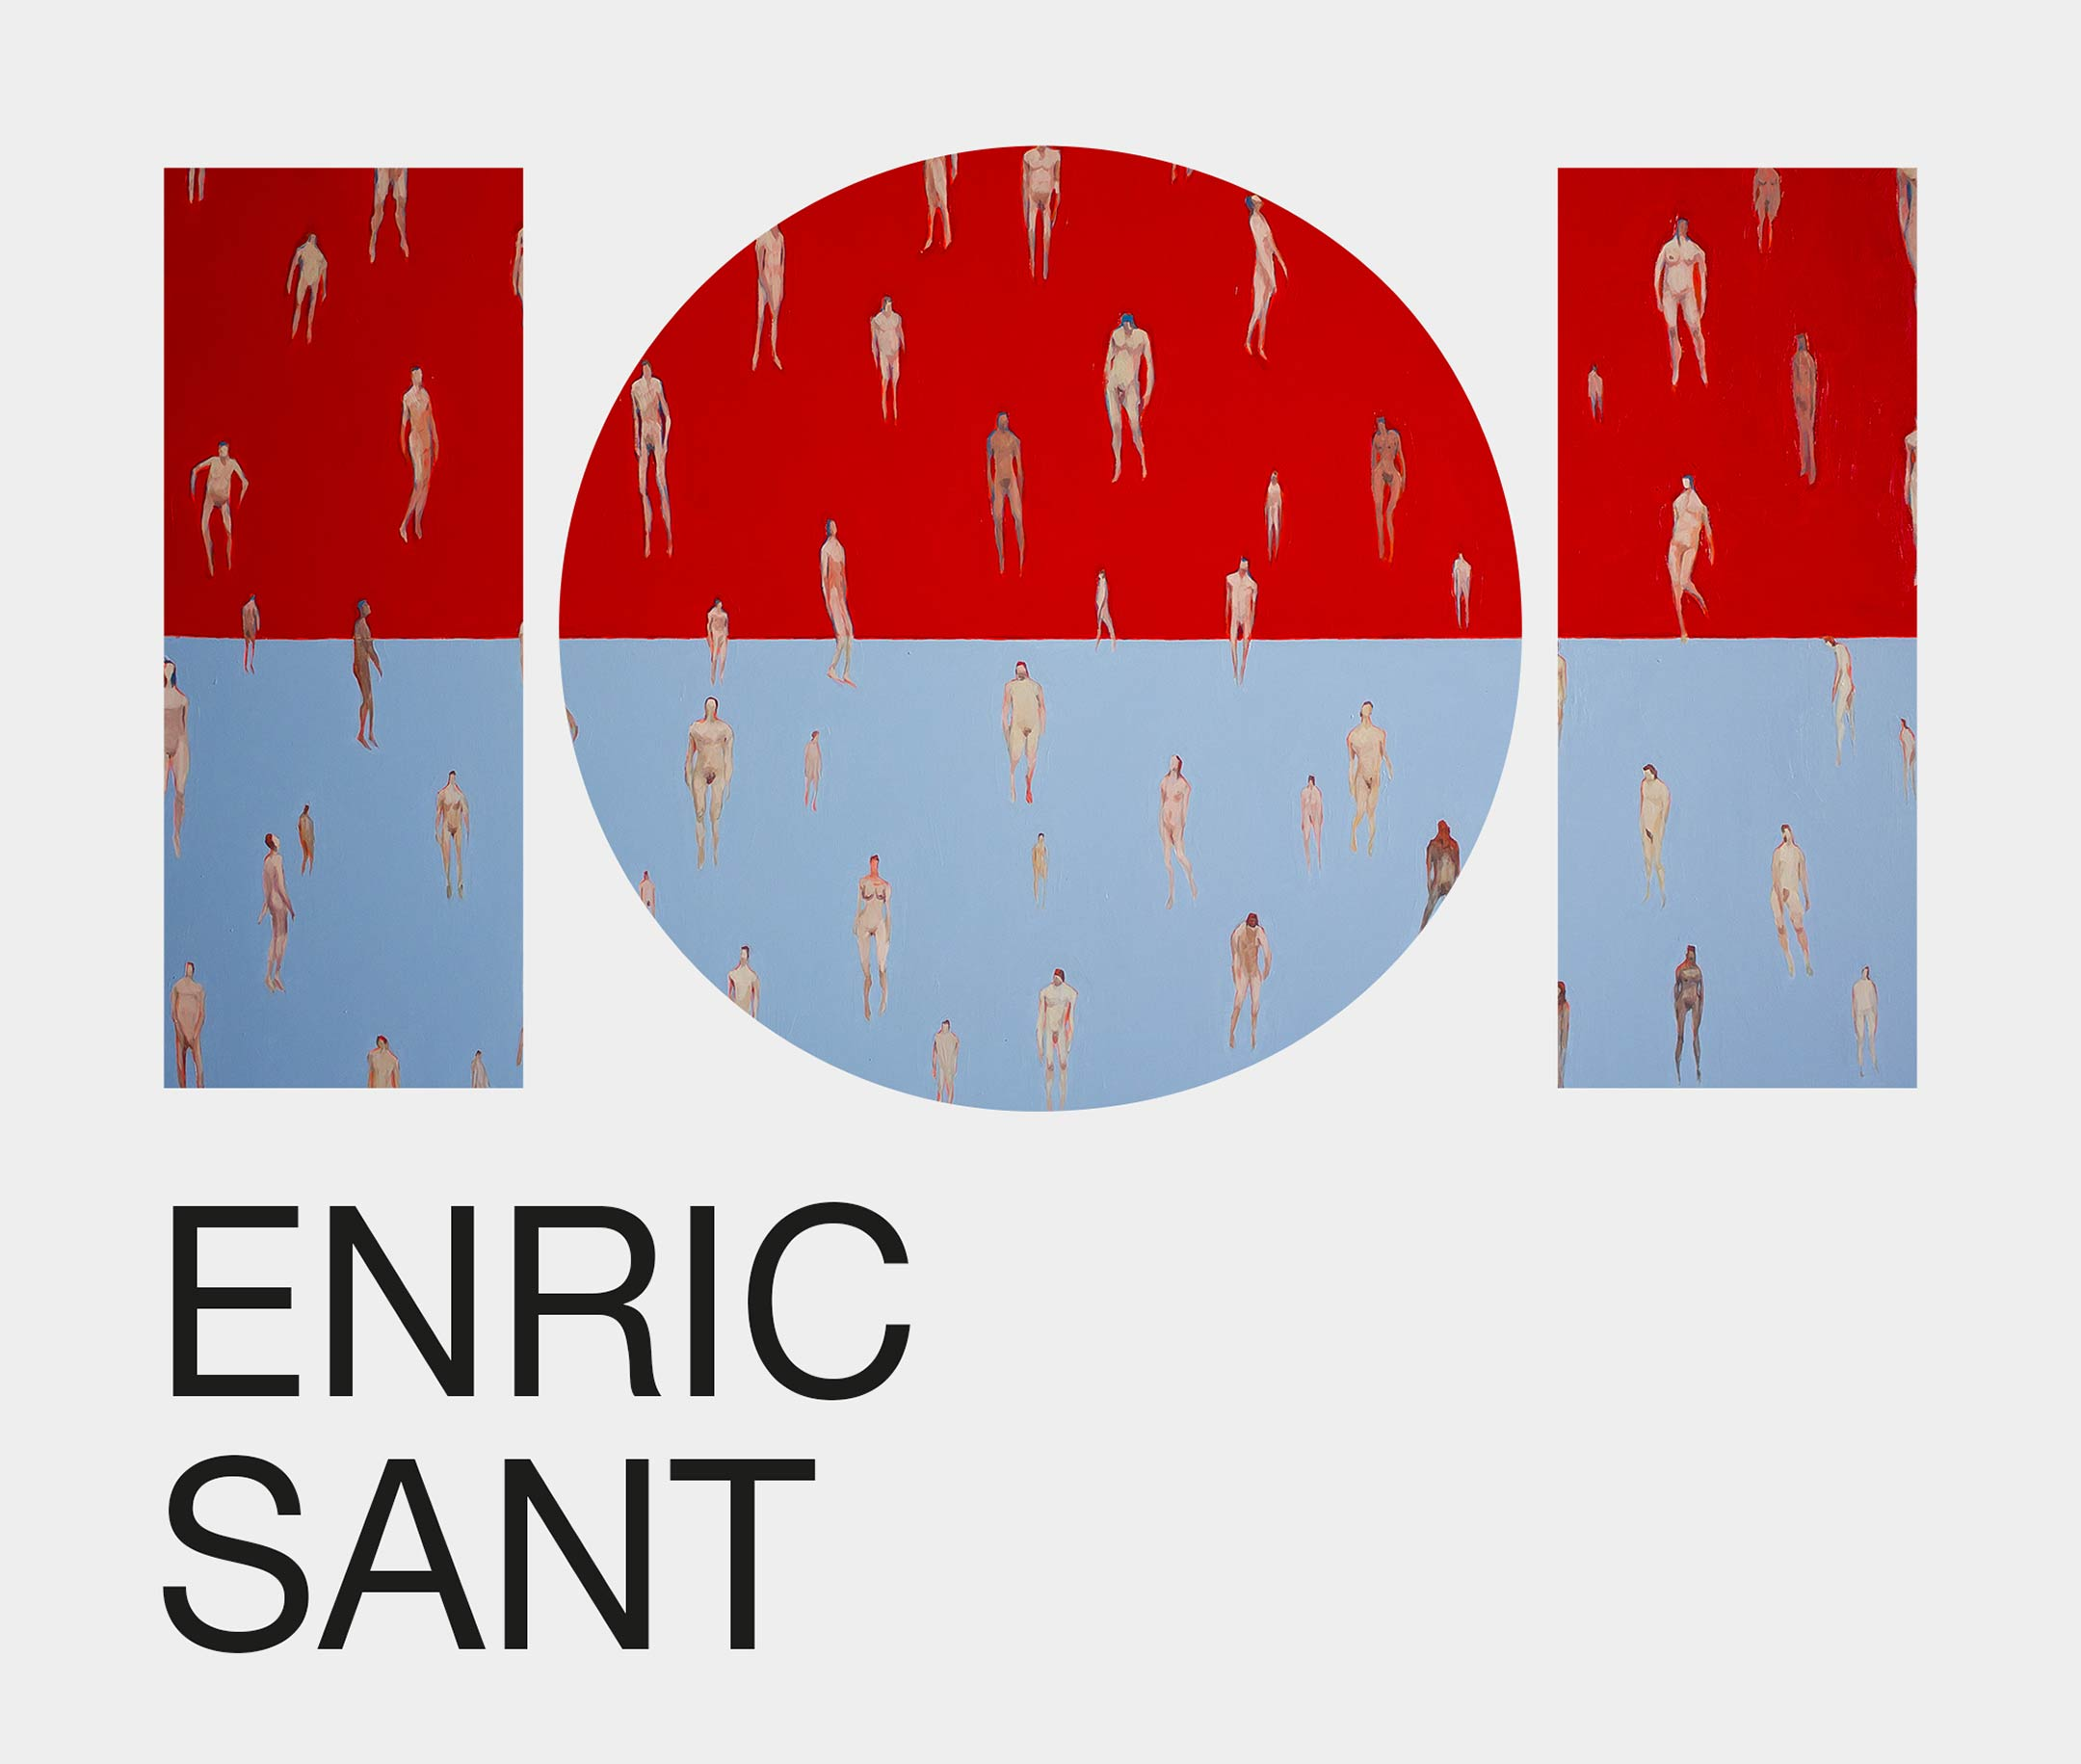 ENRIC-SANT_IG